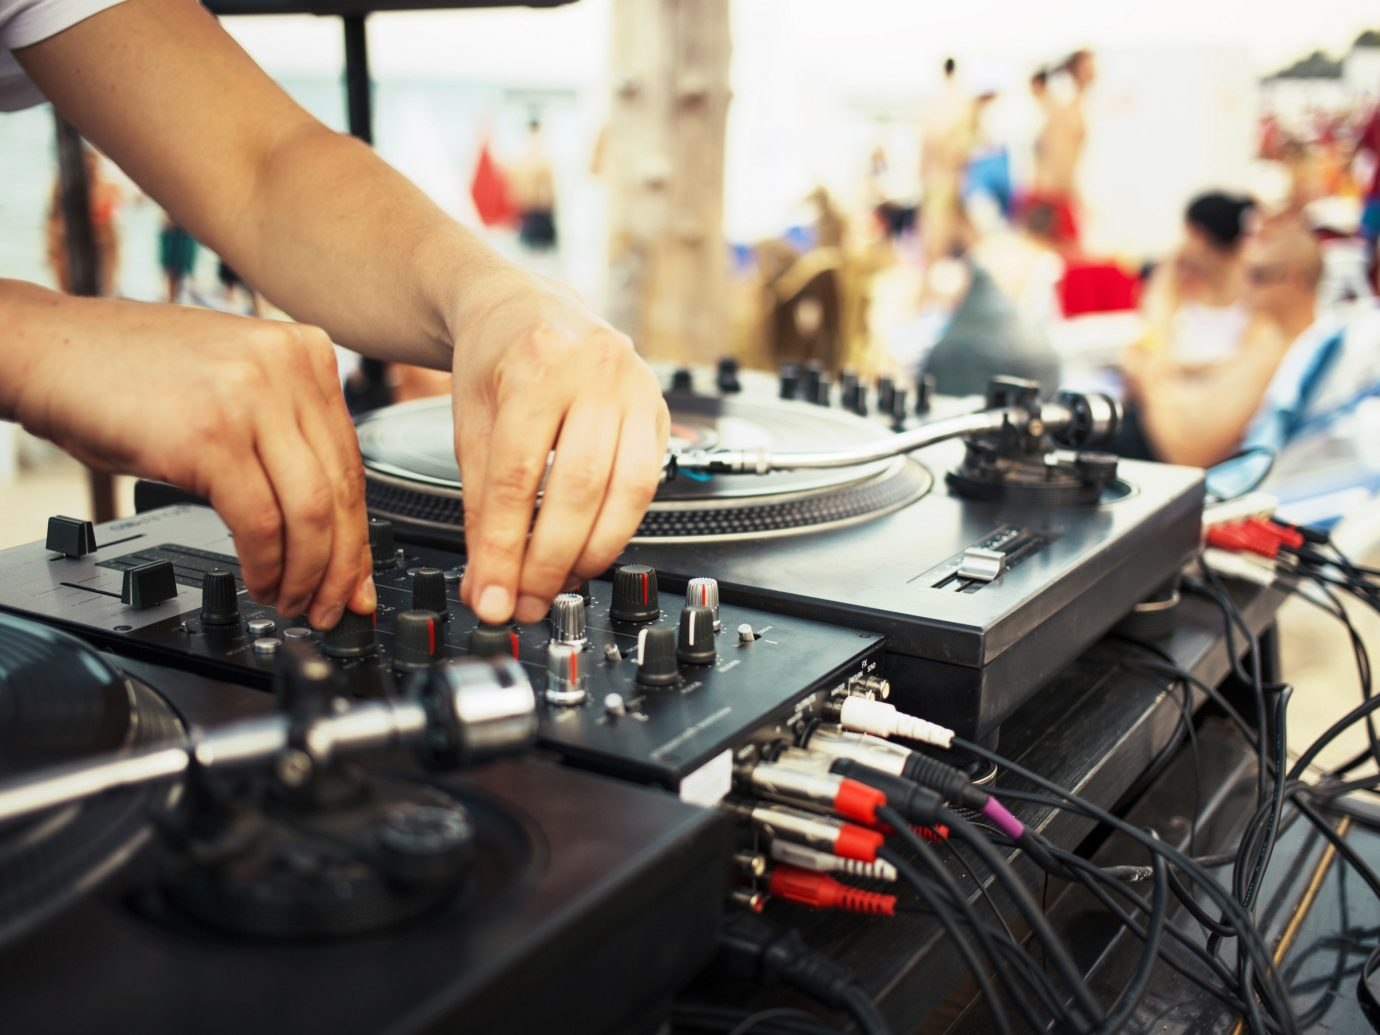 Arts + Culture person indoor disc jockey electronics cooking